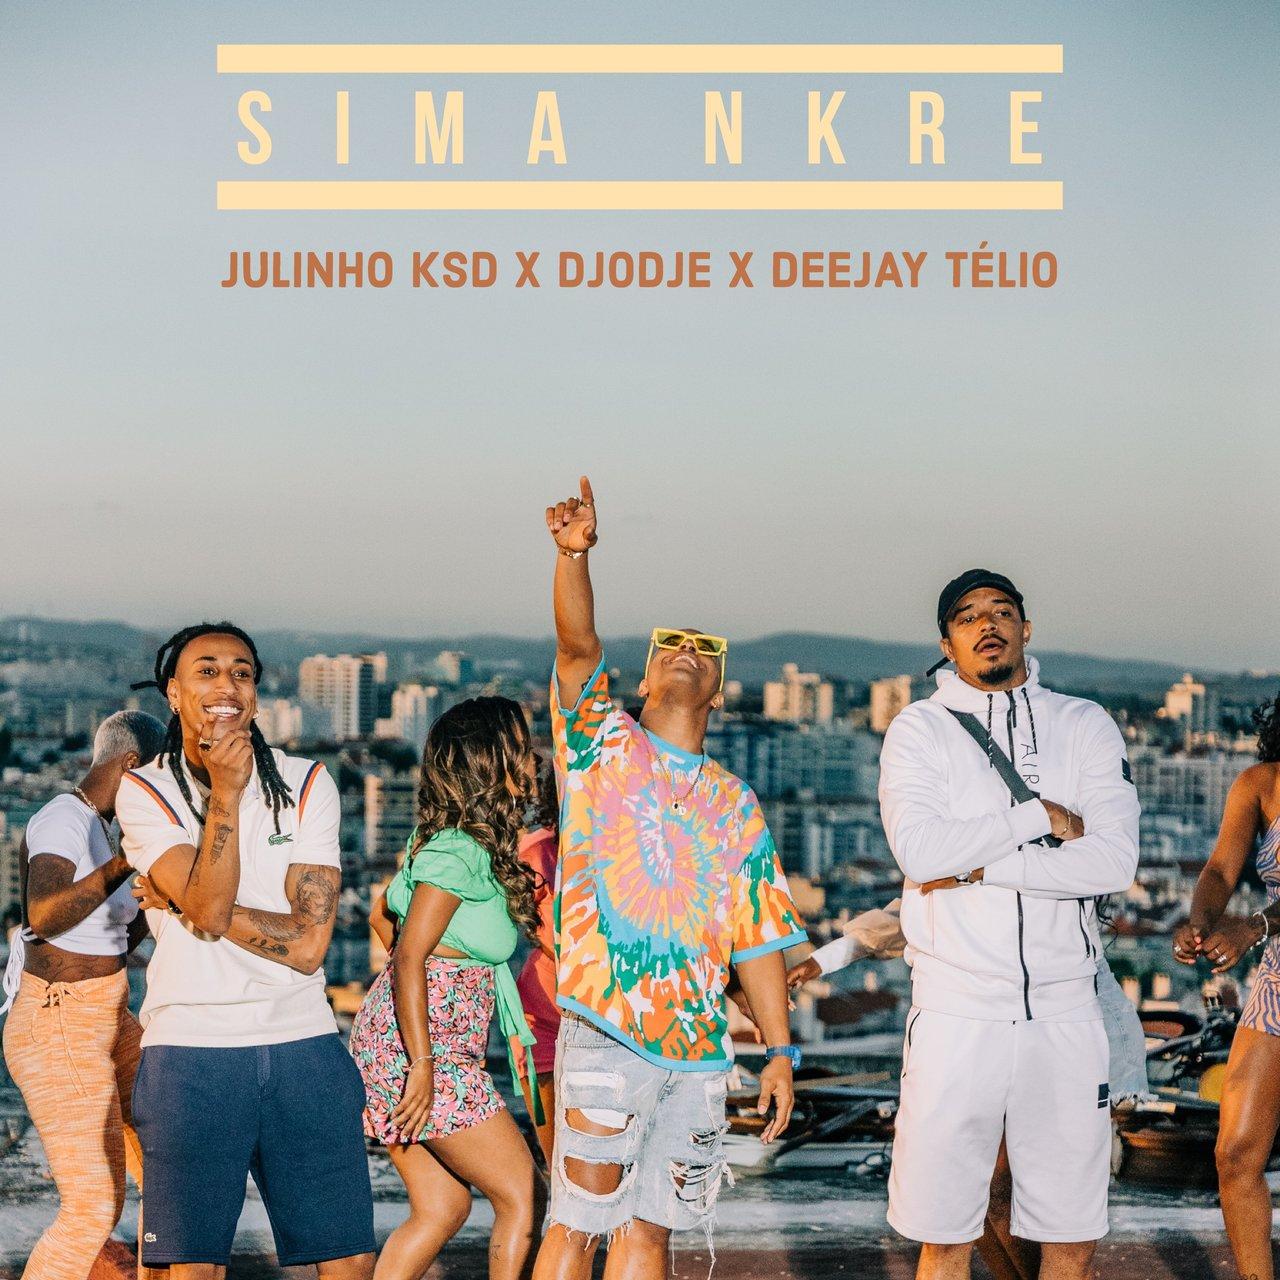 Djodje - Sima Nkre (ft. Deejay Telio and Julinho KSD) (Cover)